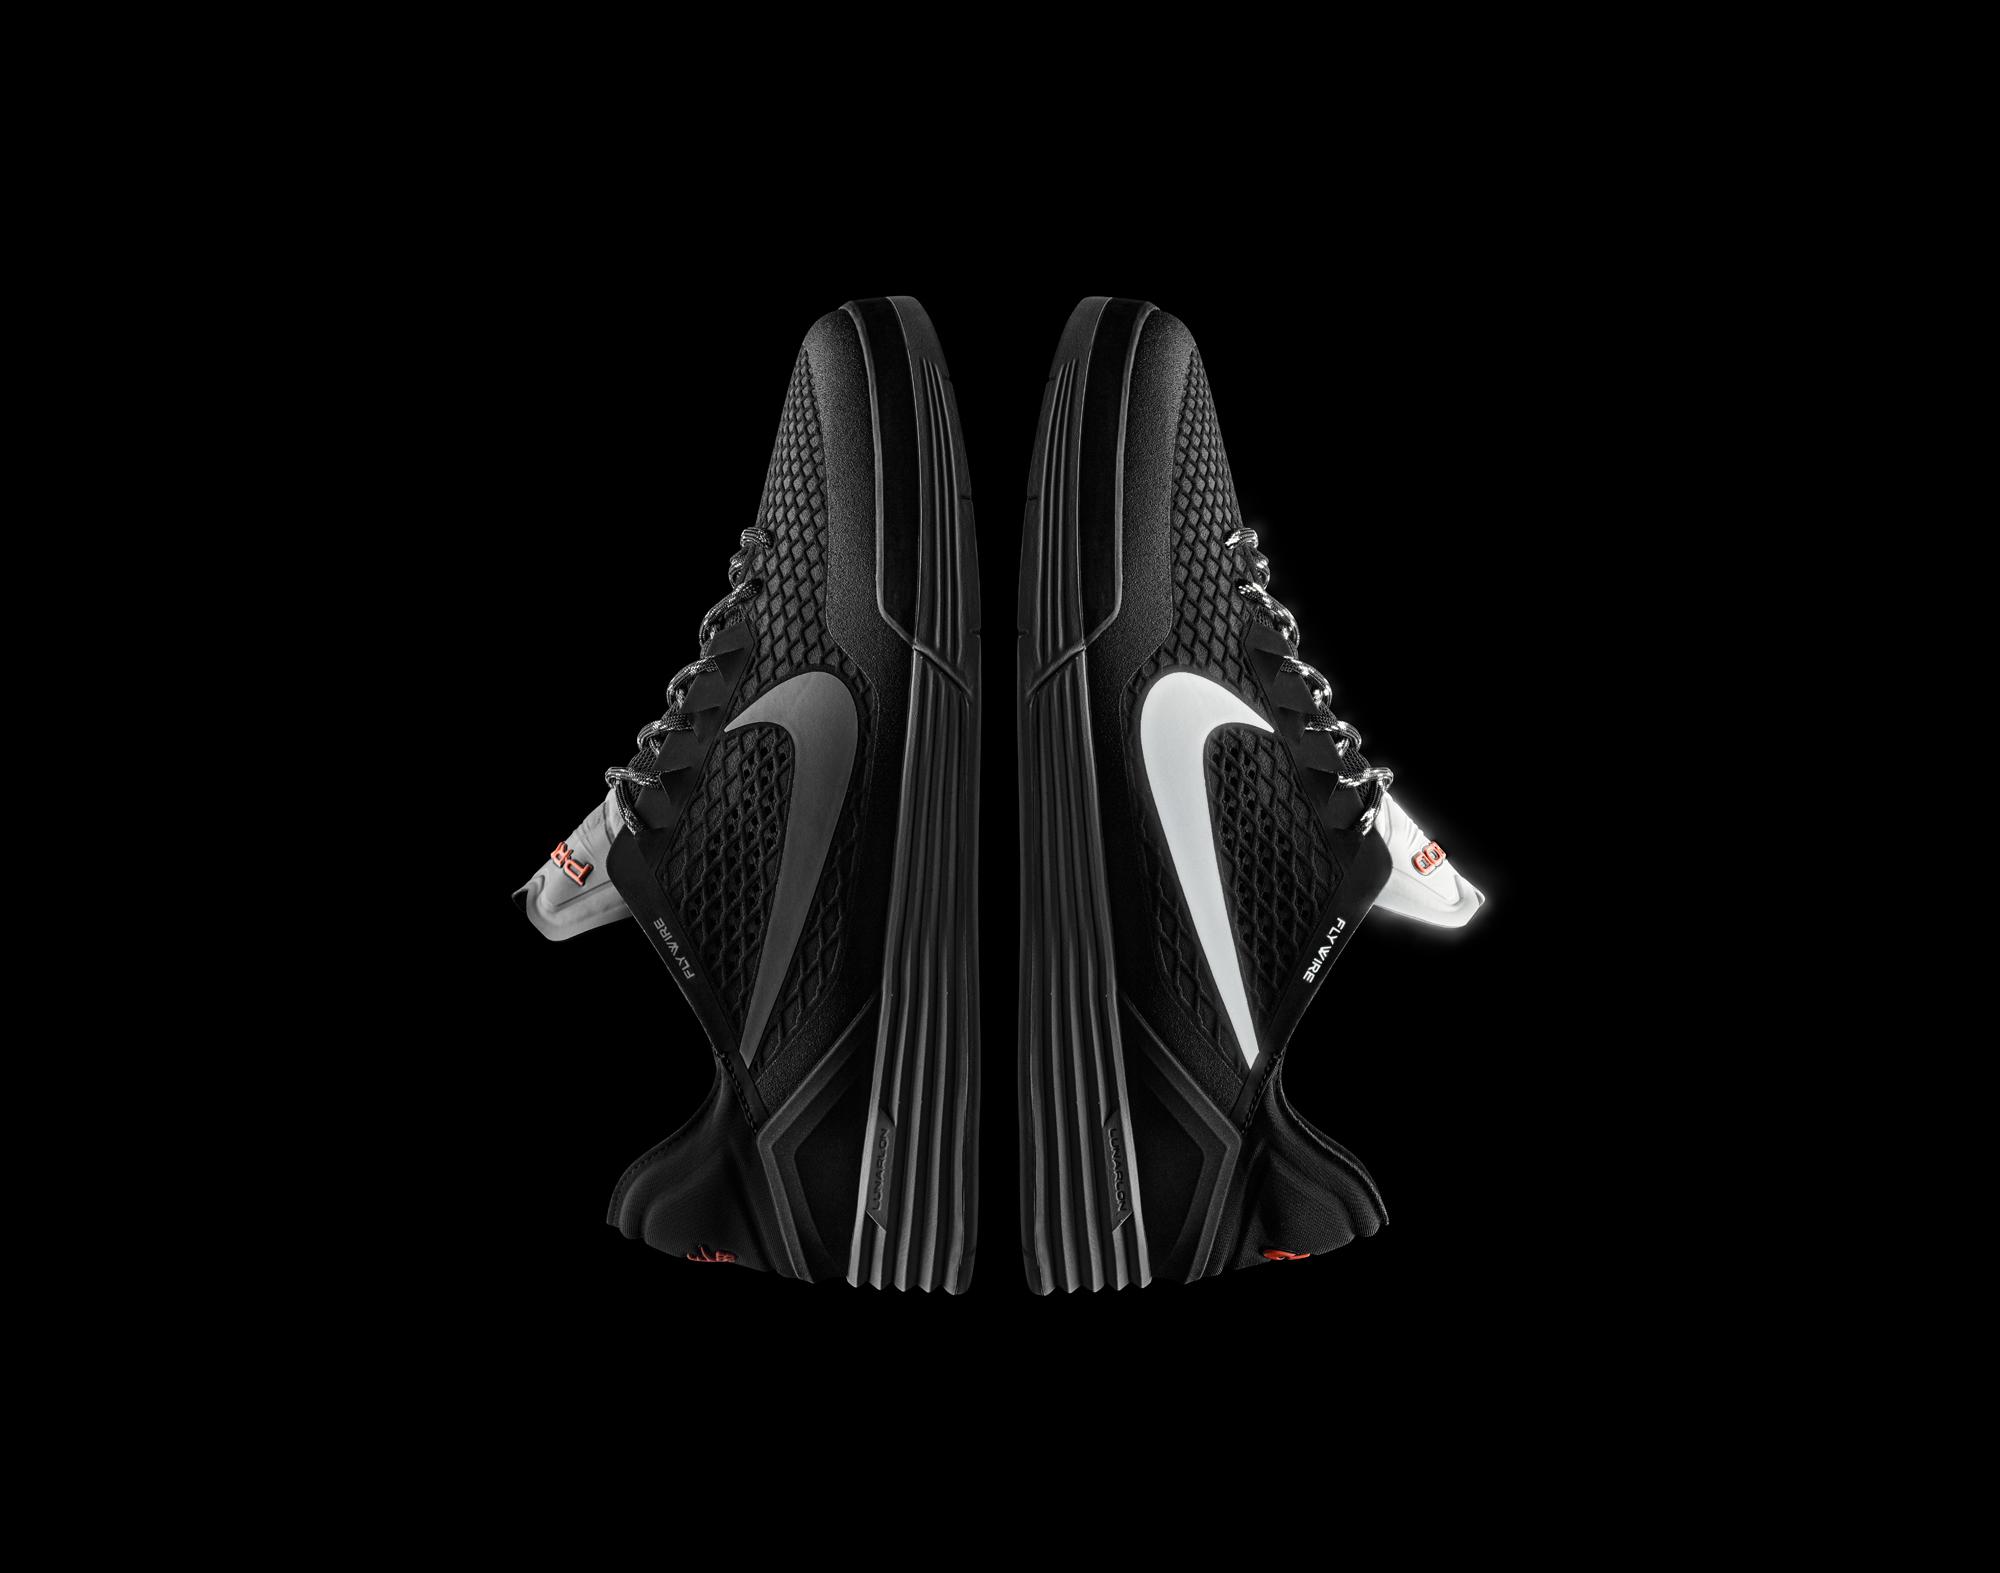 Nike_SB_HO14_FlashPack_PROD_Butterfly_33403